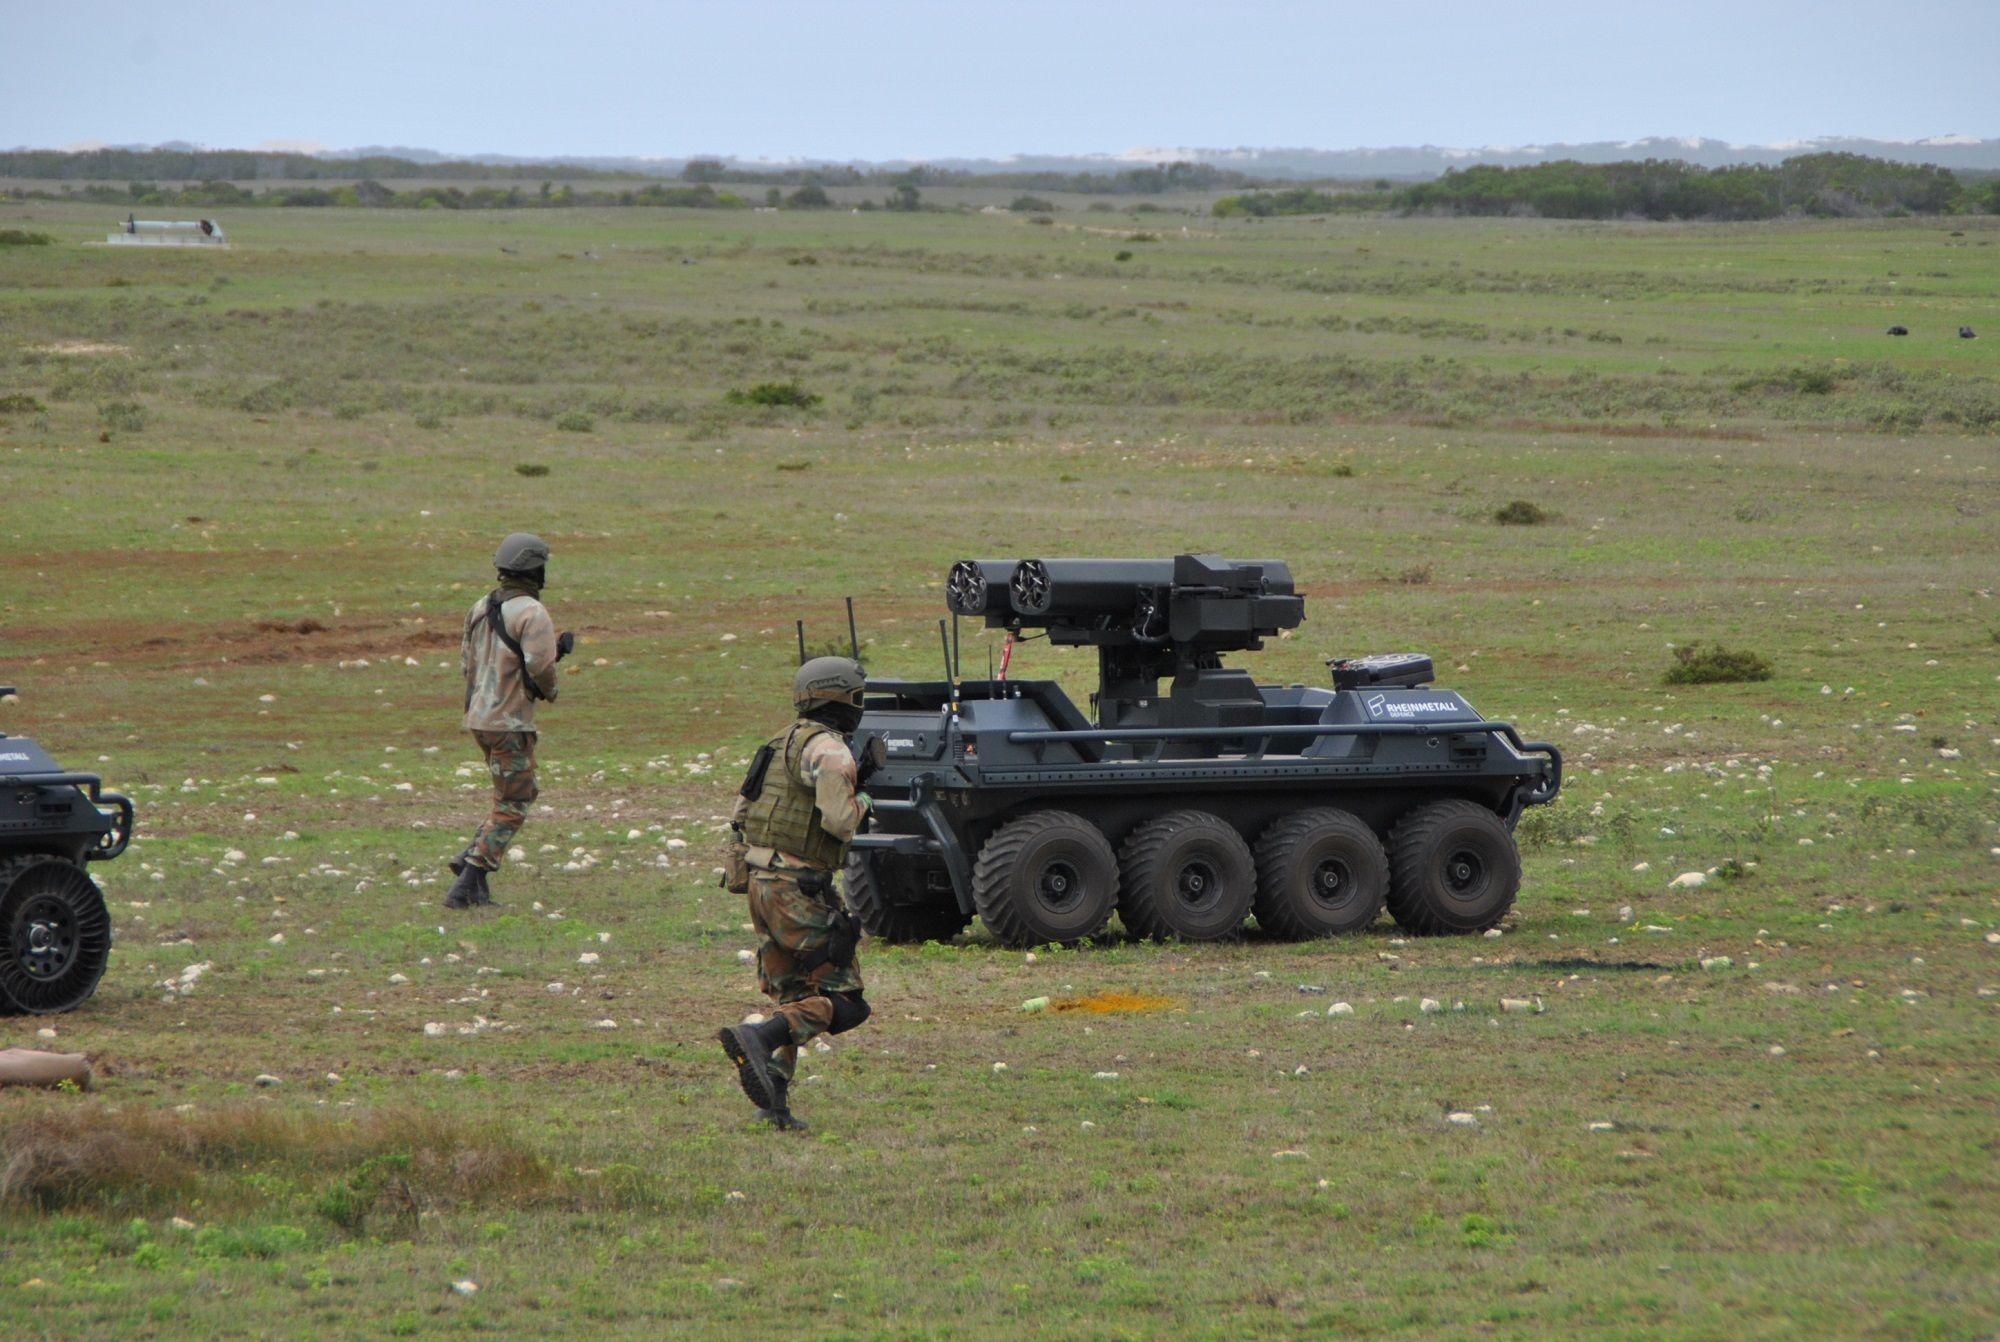 SANDF Special Forces team with Rheinmetall Ground Master unmanned ground vehicle. (Photo: DPM)